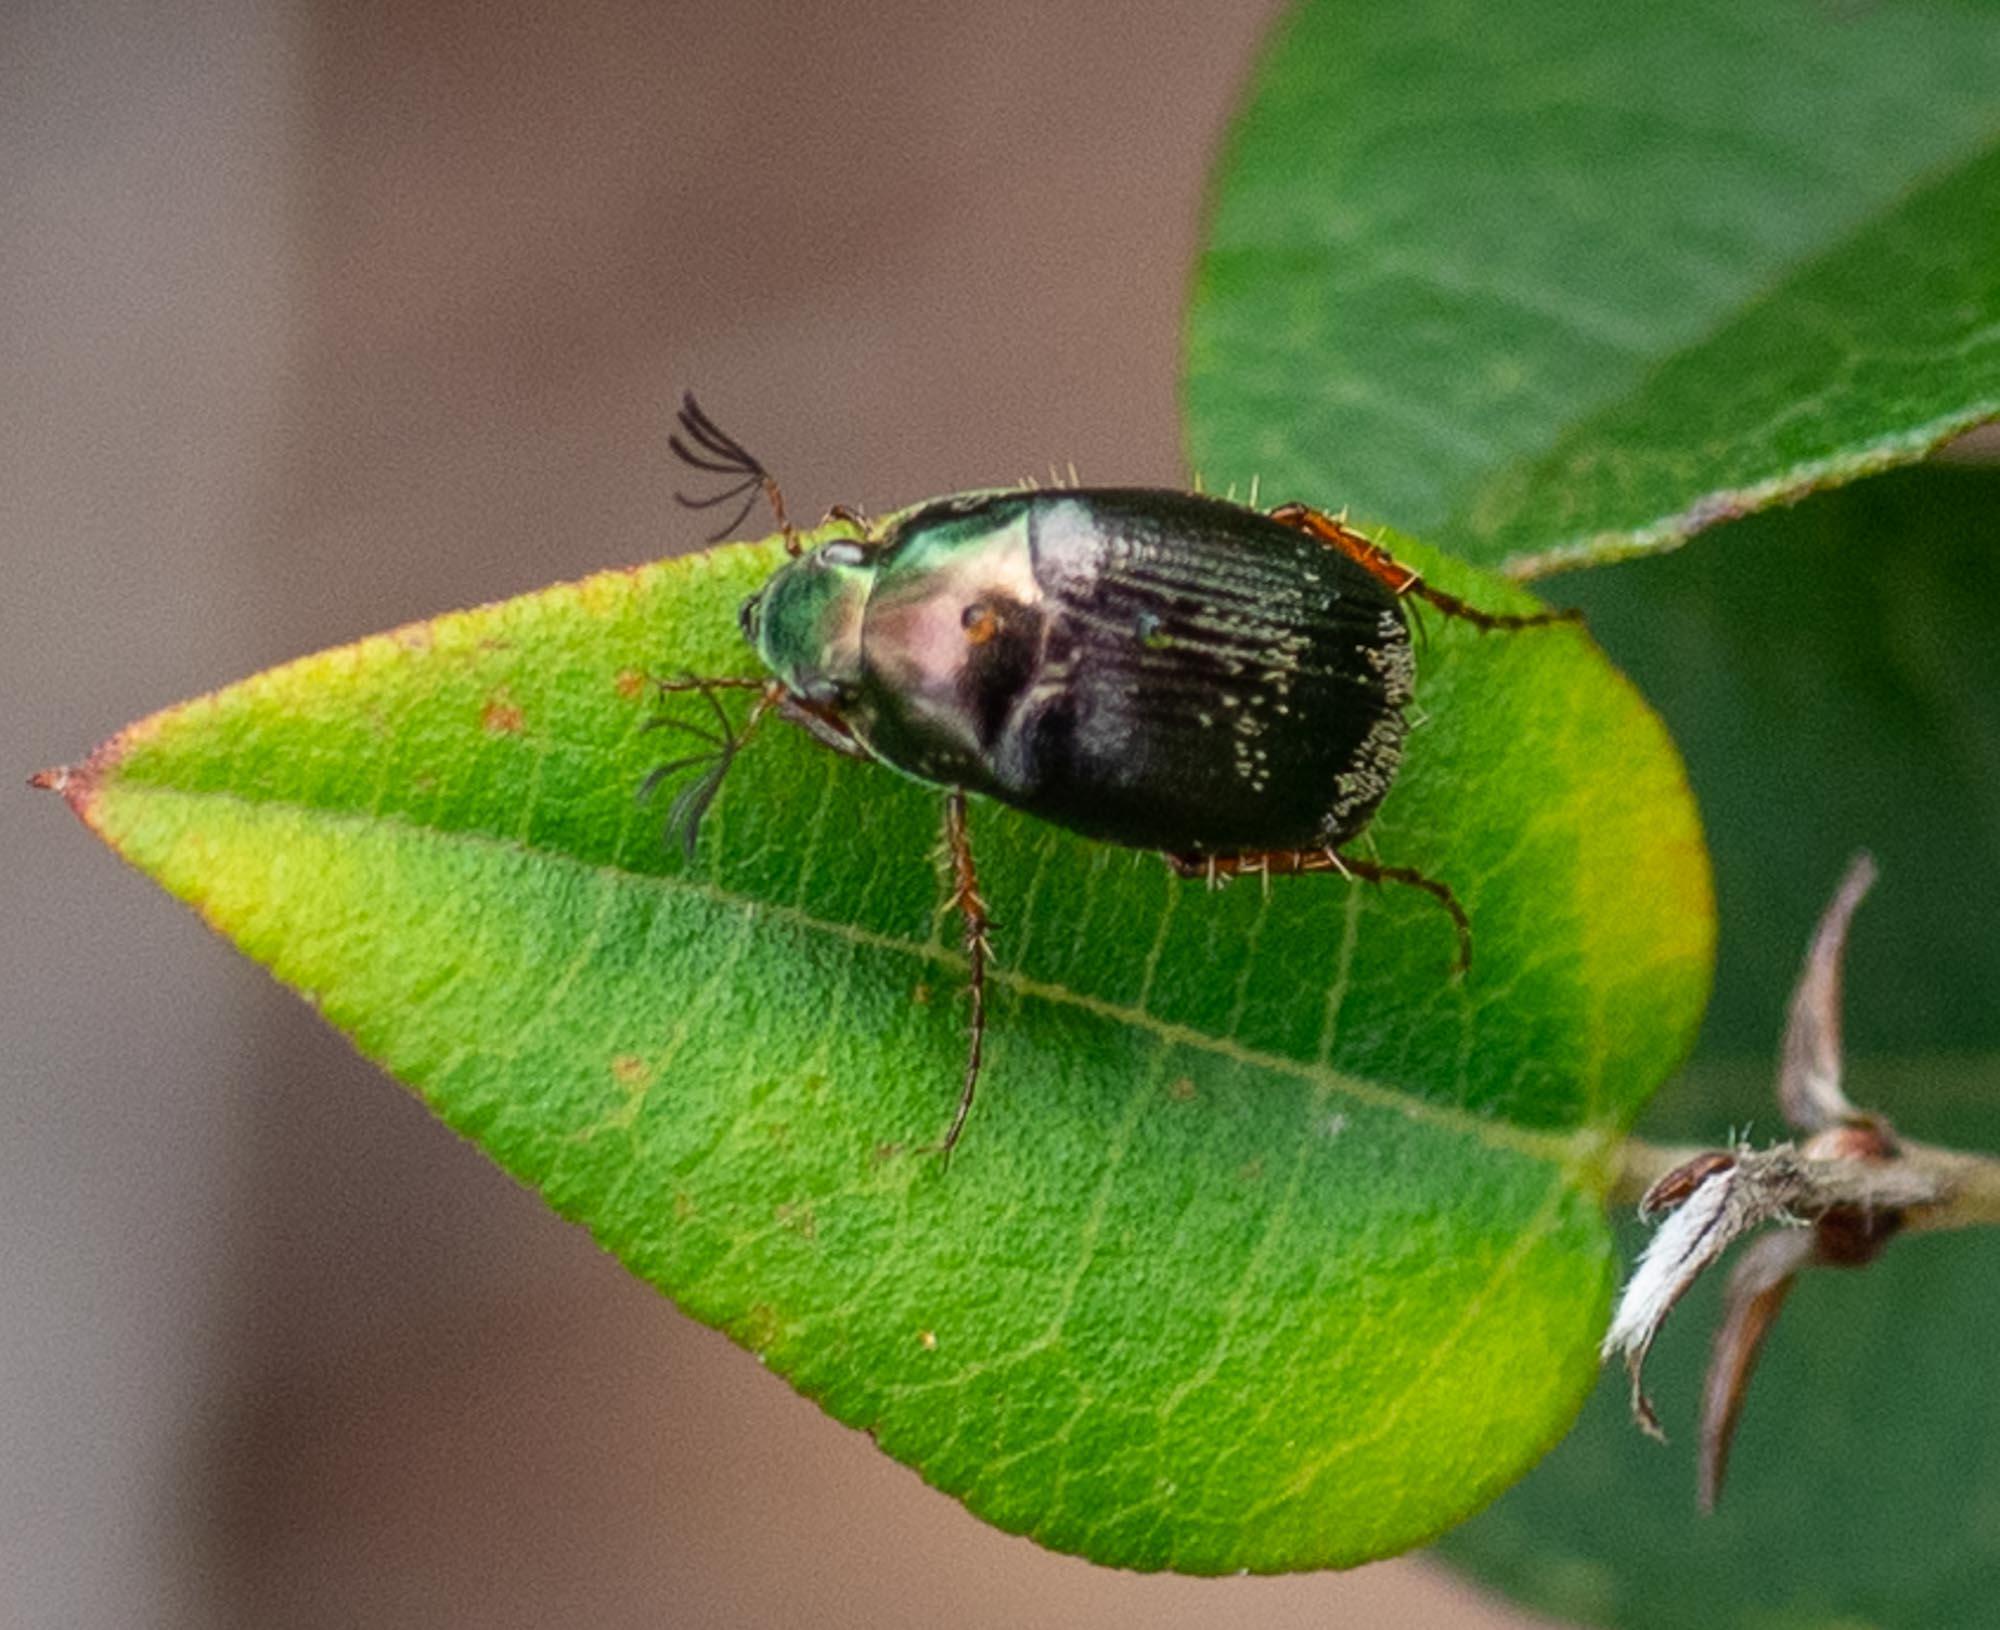 a leaf-eating beetle